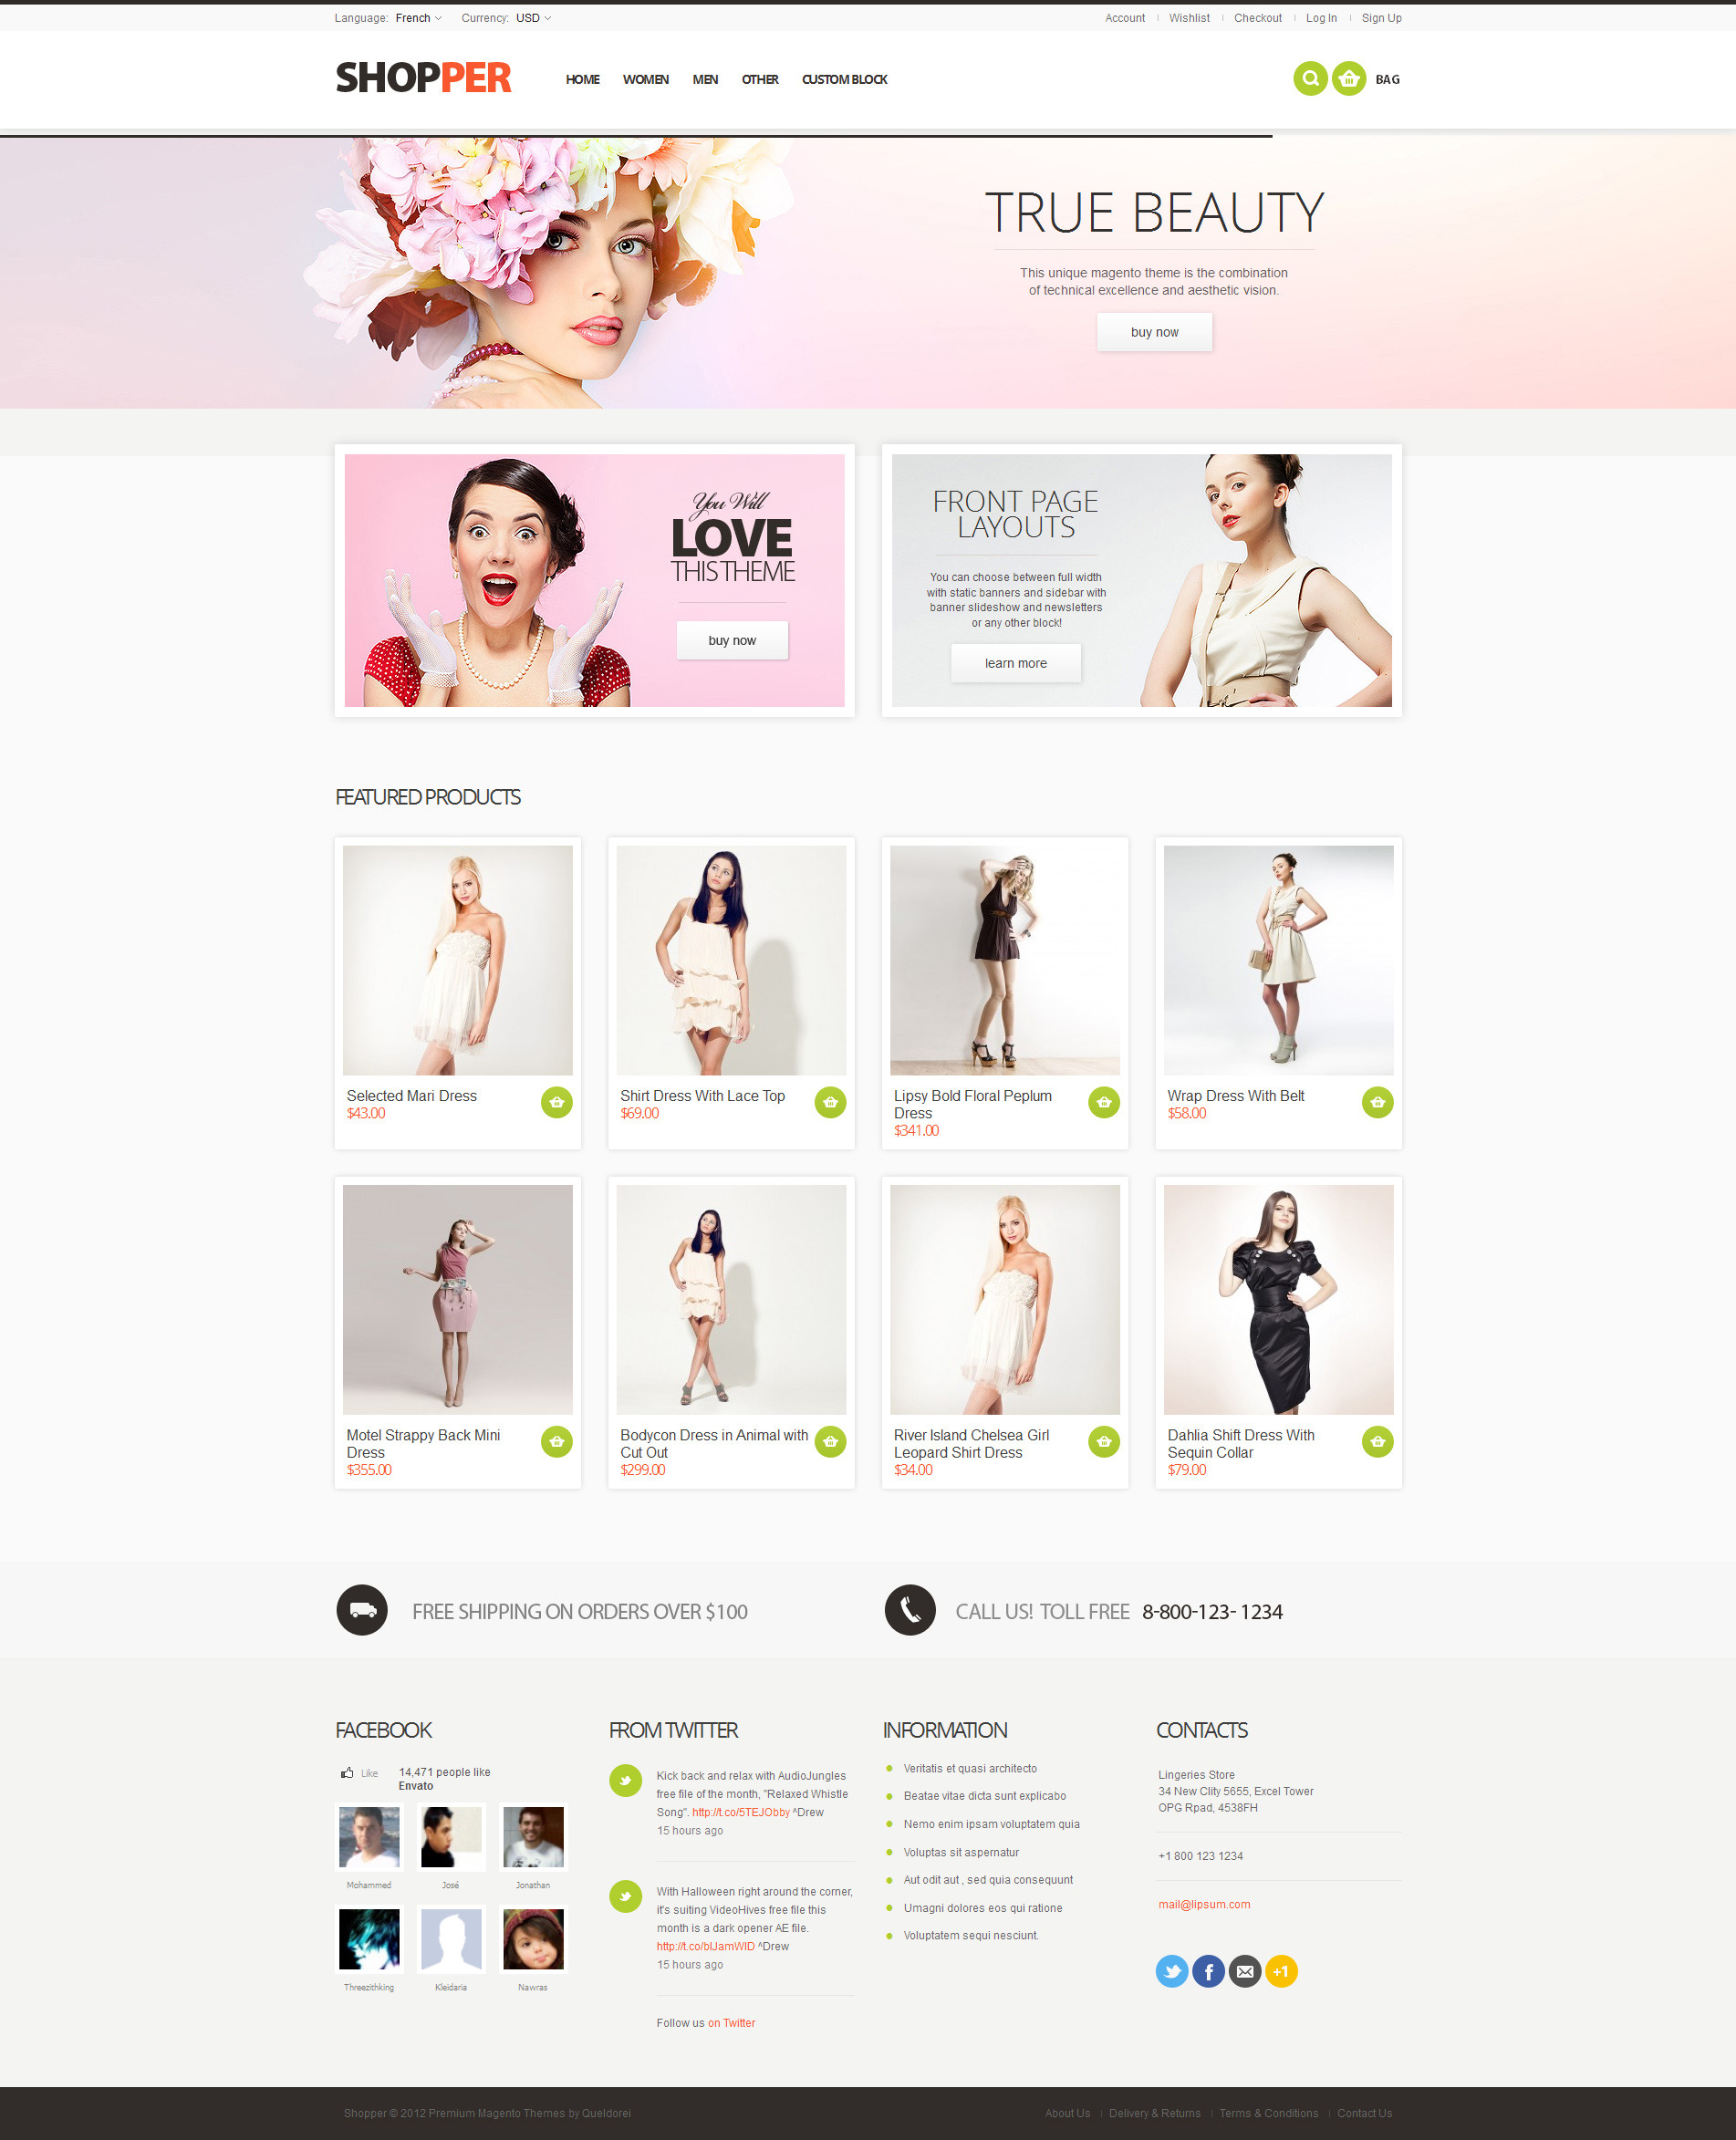 Shopper - Magento Theme, Responsive & Retina Ready